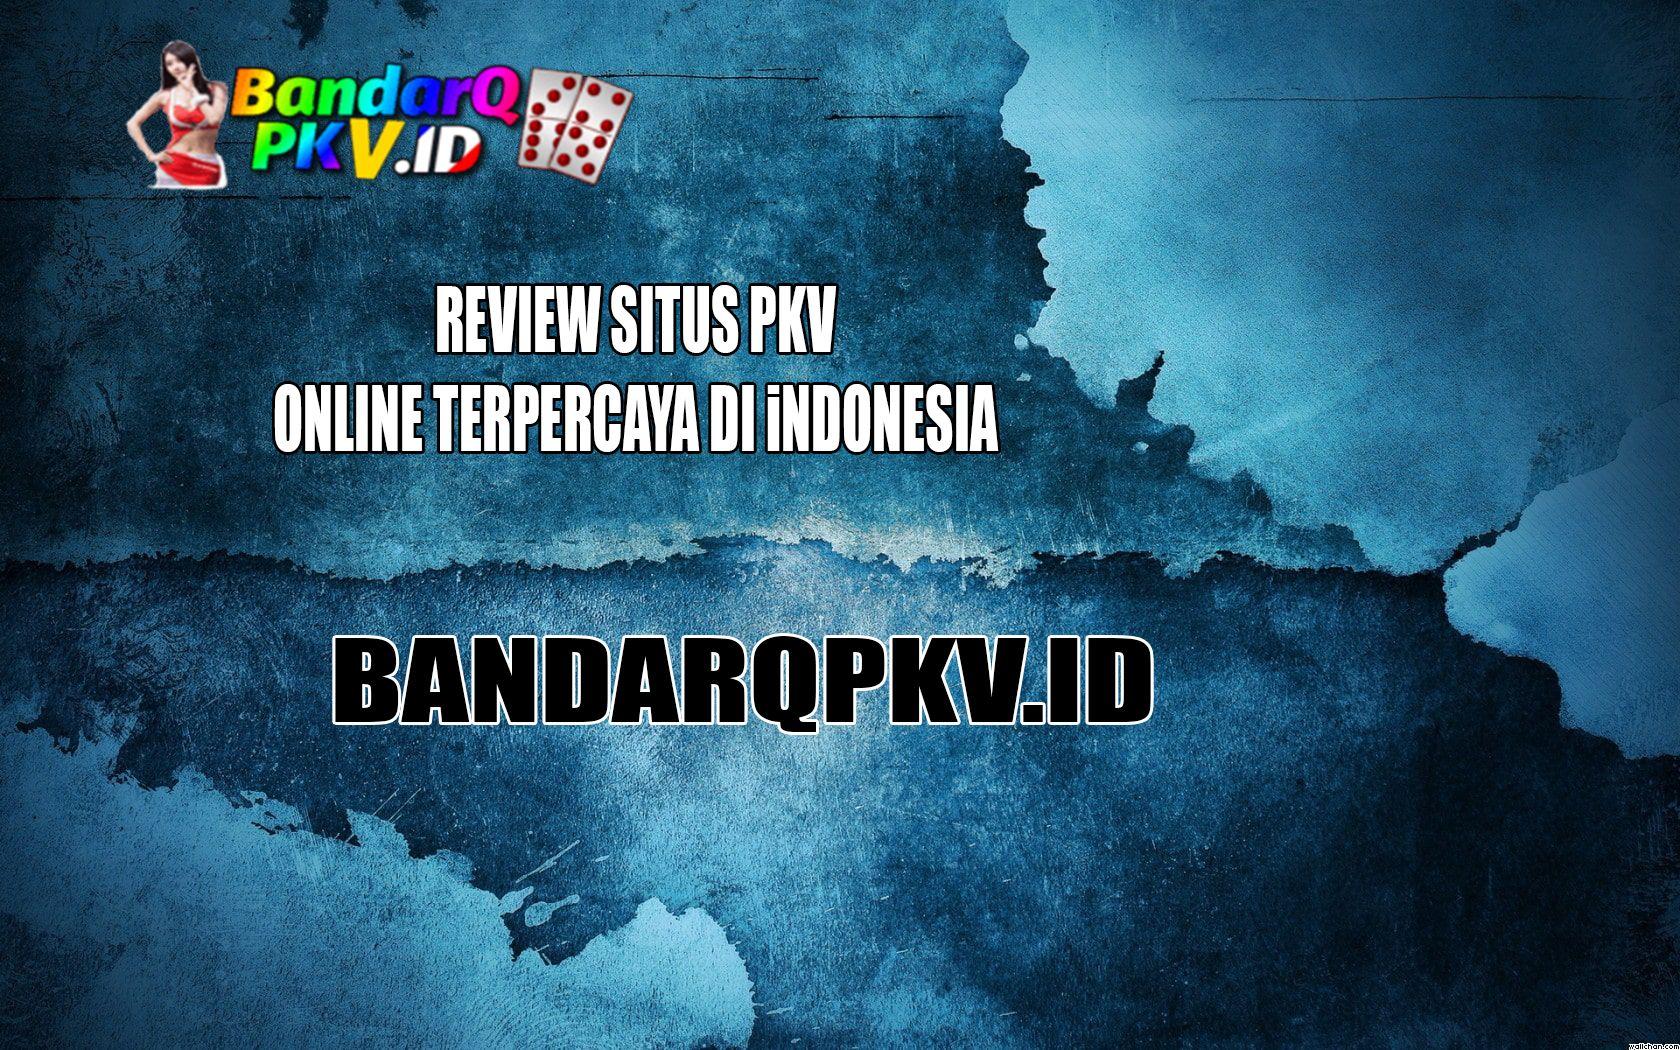 Bandarqpkv Bandarq Pkv Bandarq Pkv Pkv Games Online Online Online Games Movie Posters